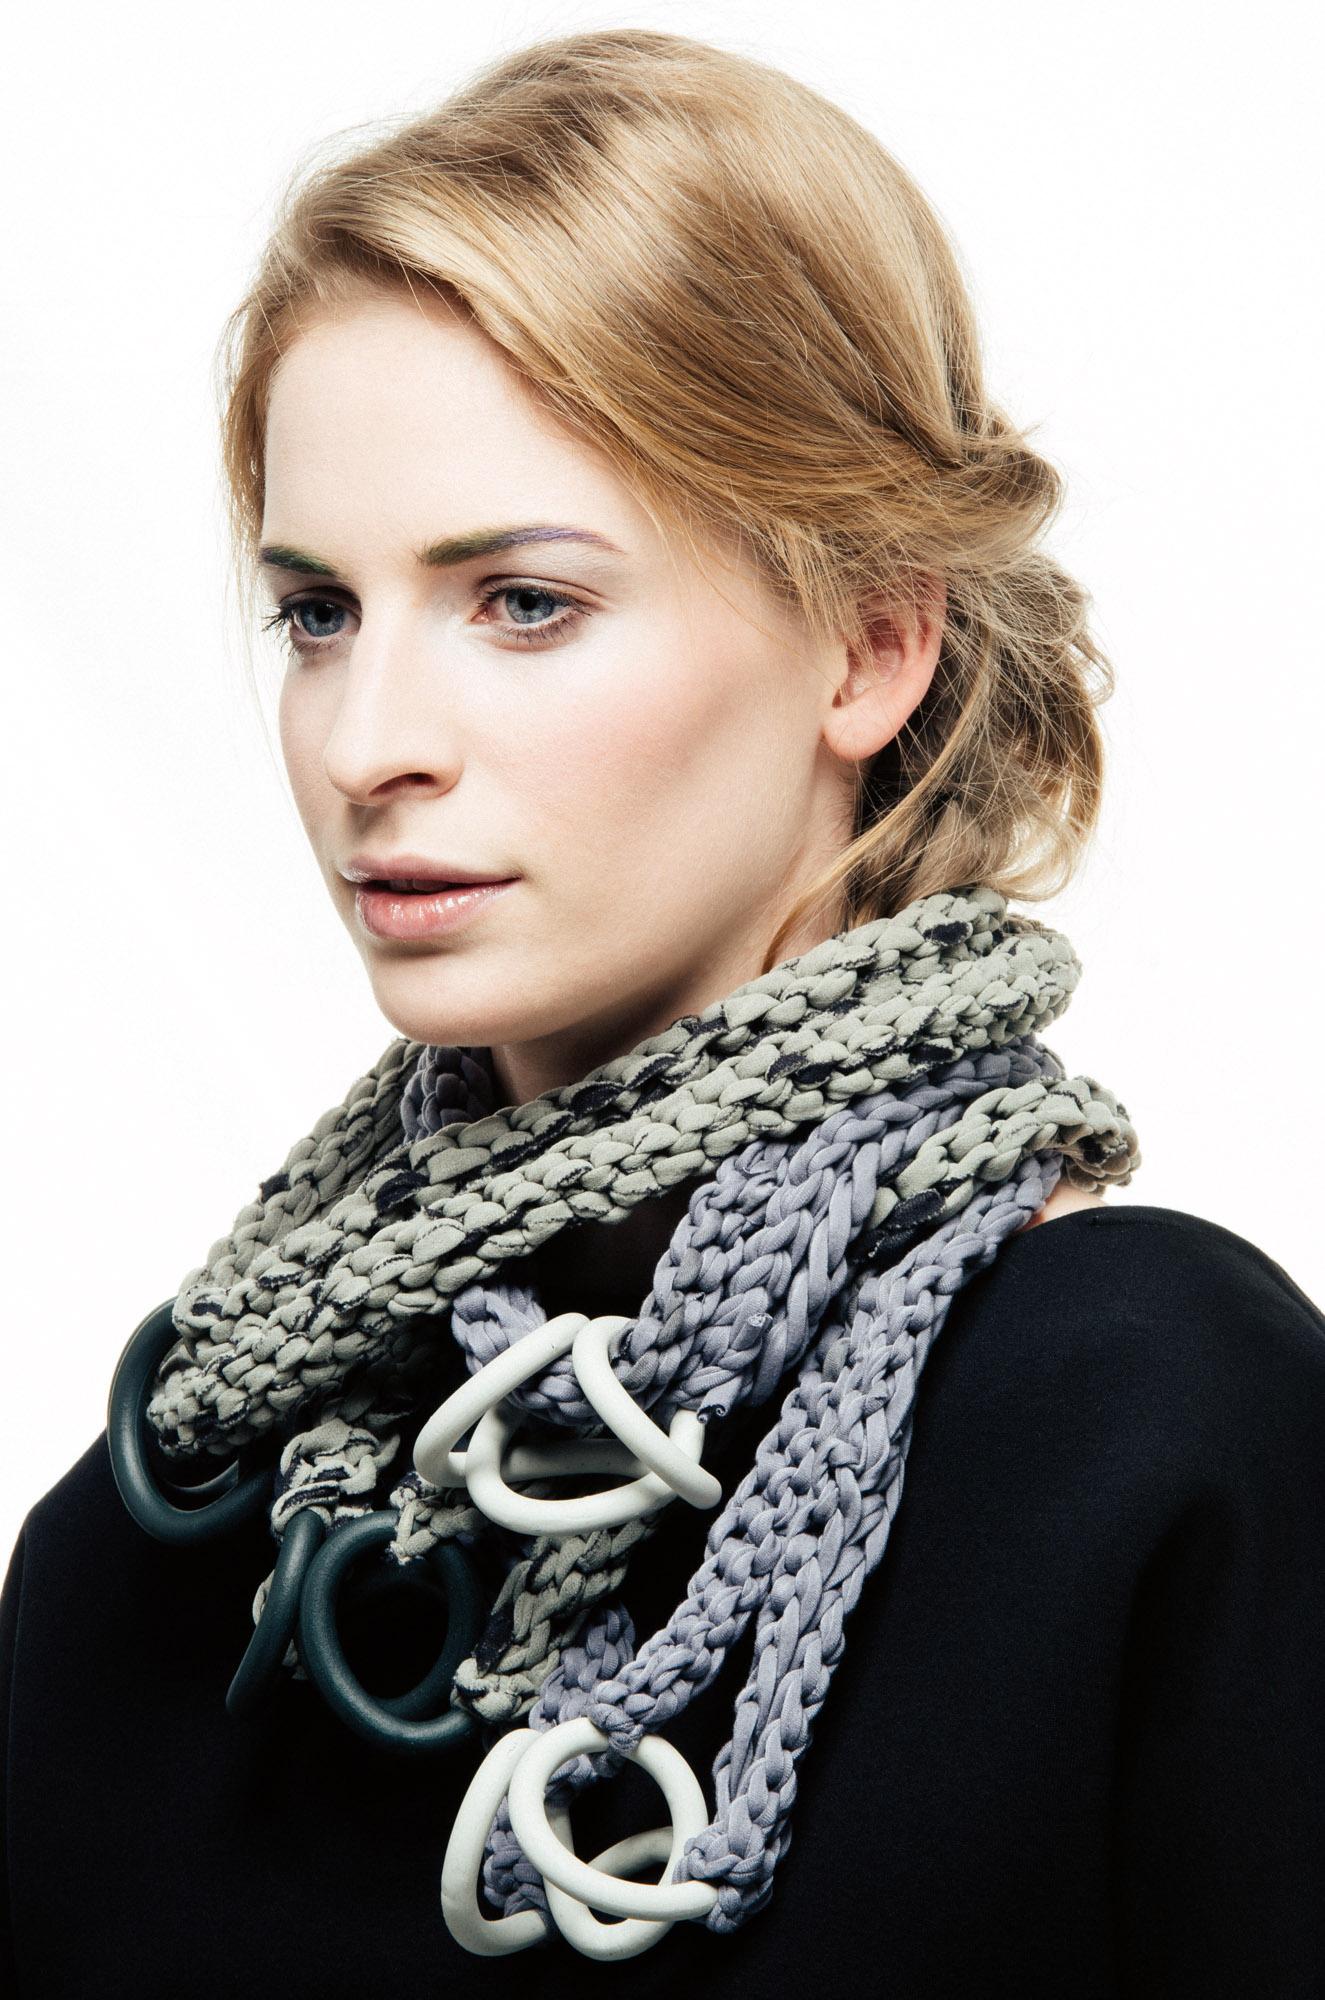 Bocco necklace by Anna Borshi 01.jpg